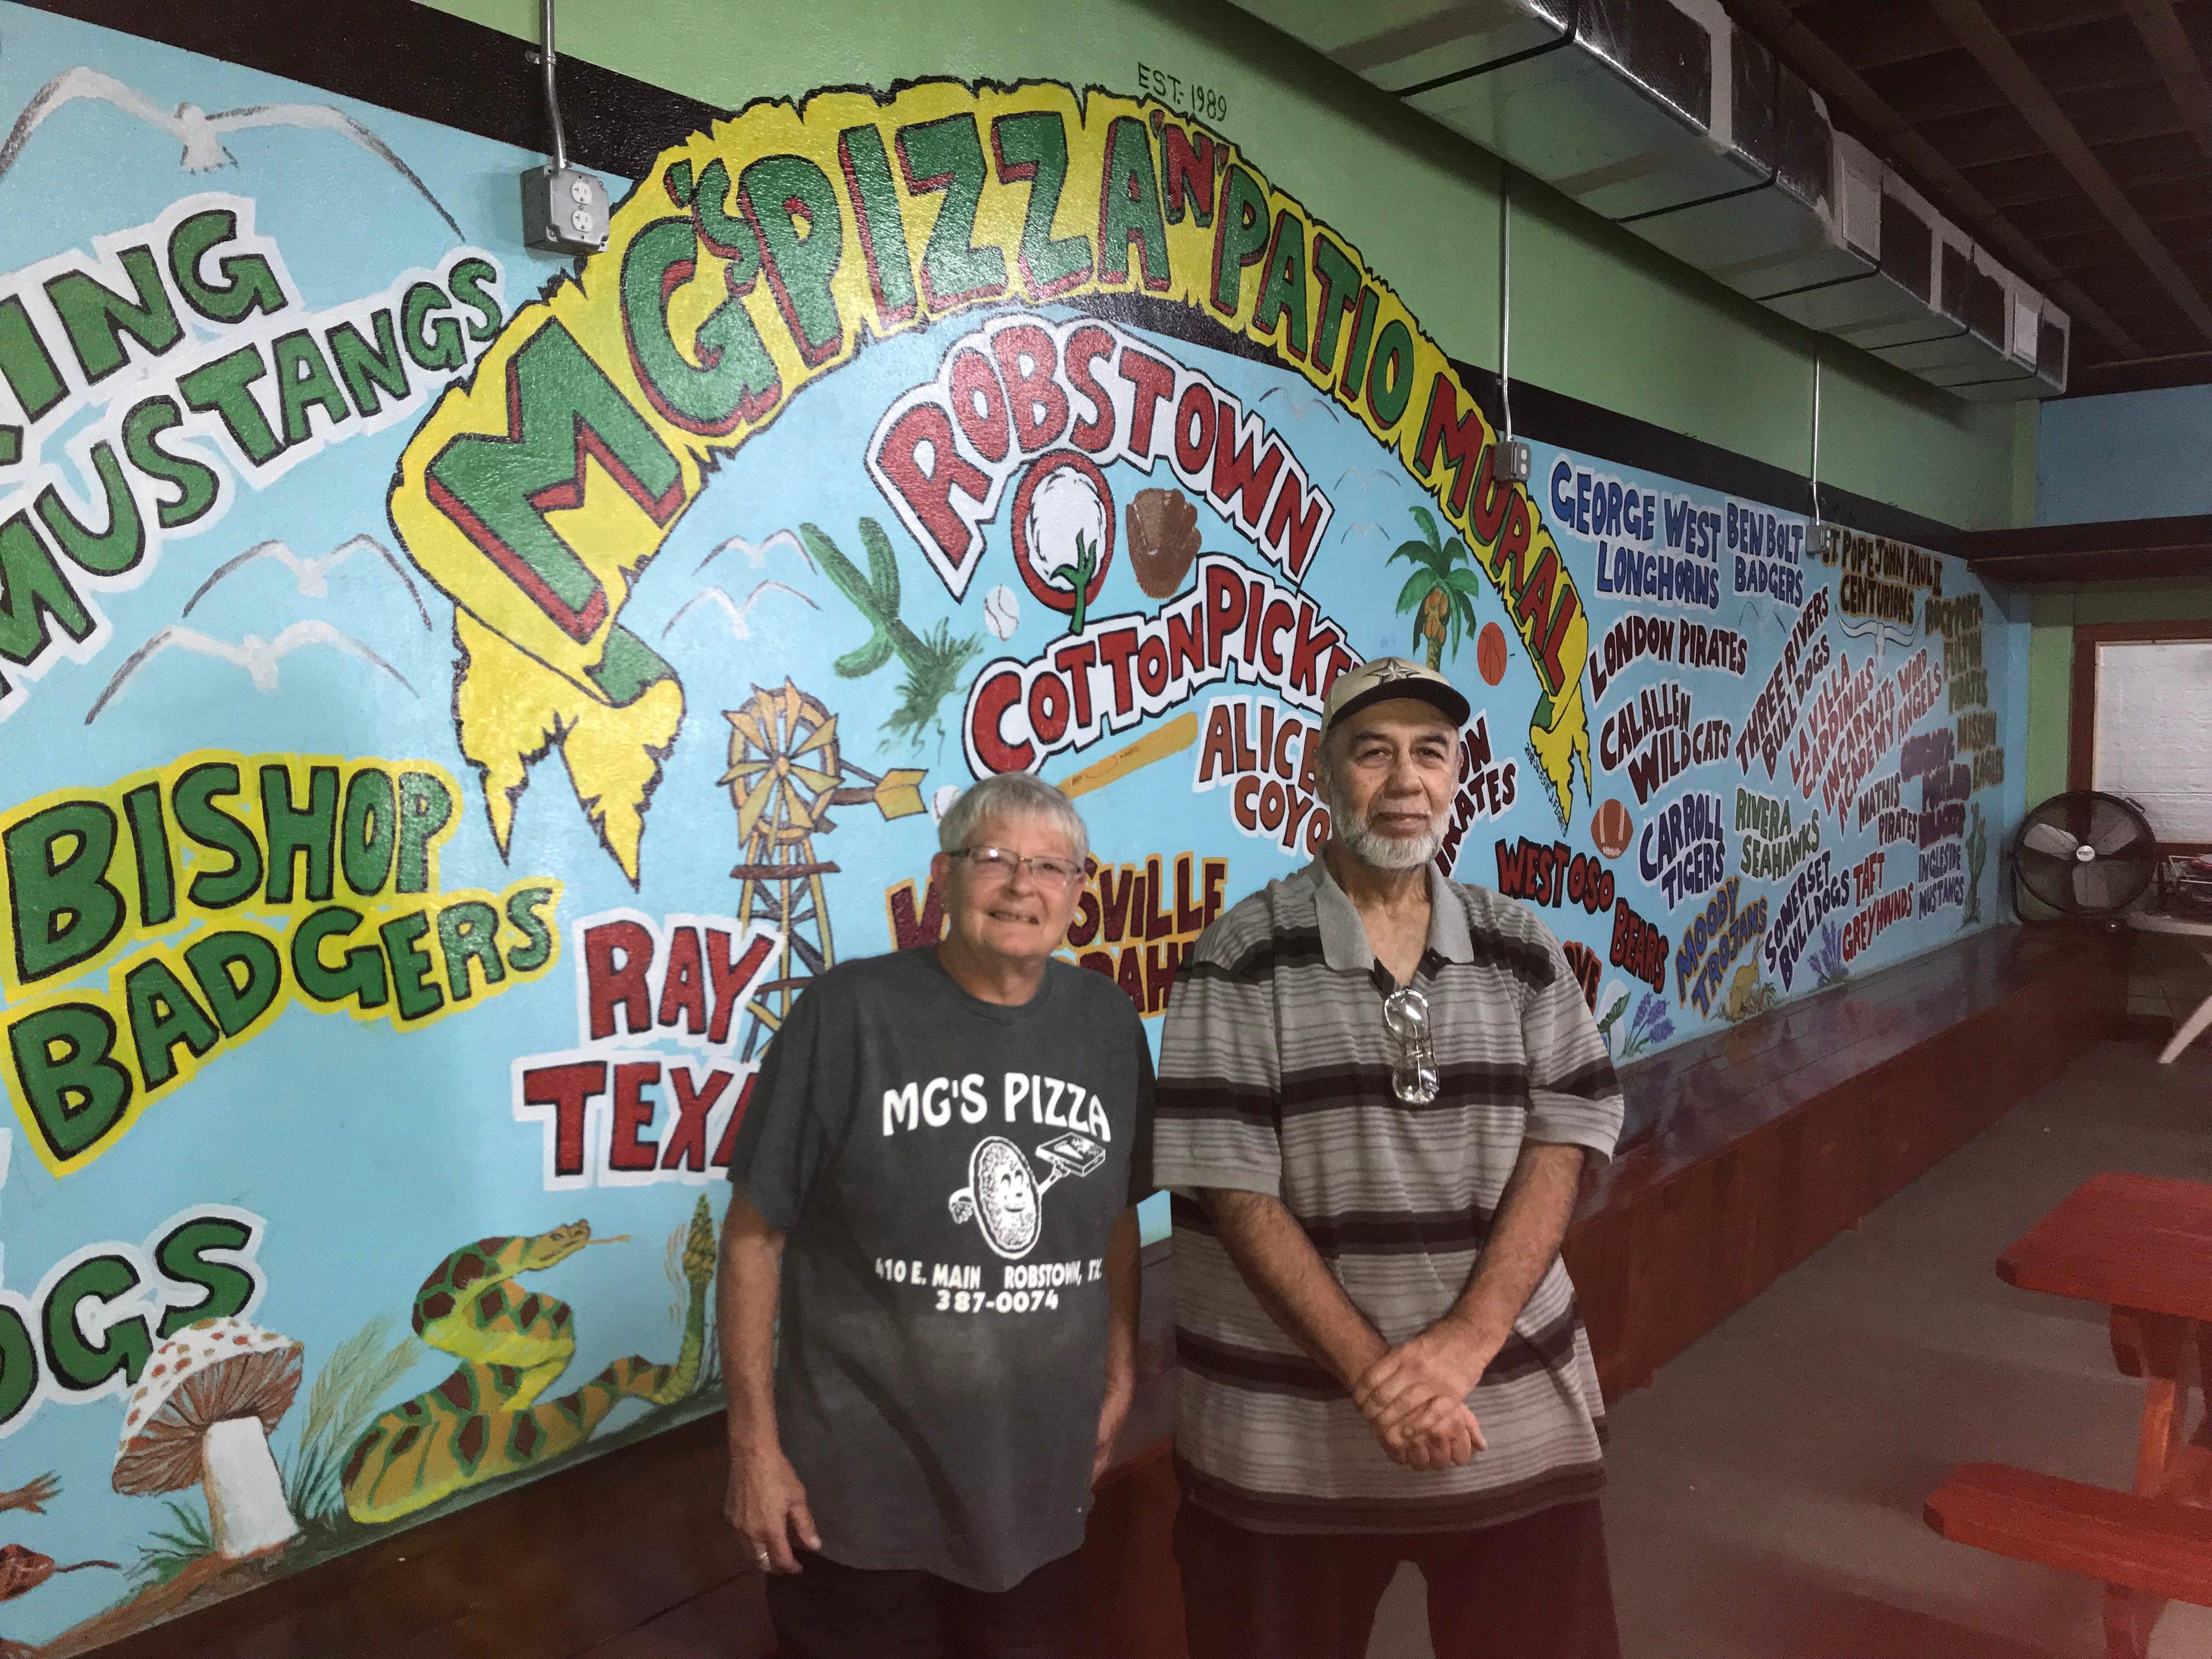 Robstown Restaurant Mural Offers Patrons Chance To Show School Spirit